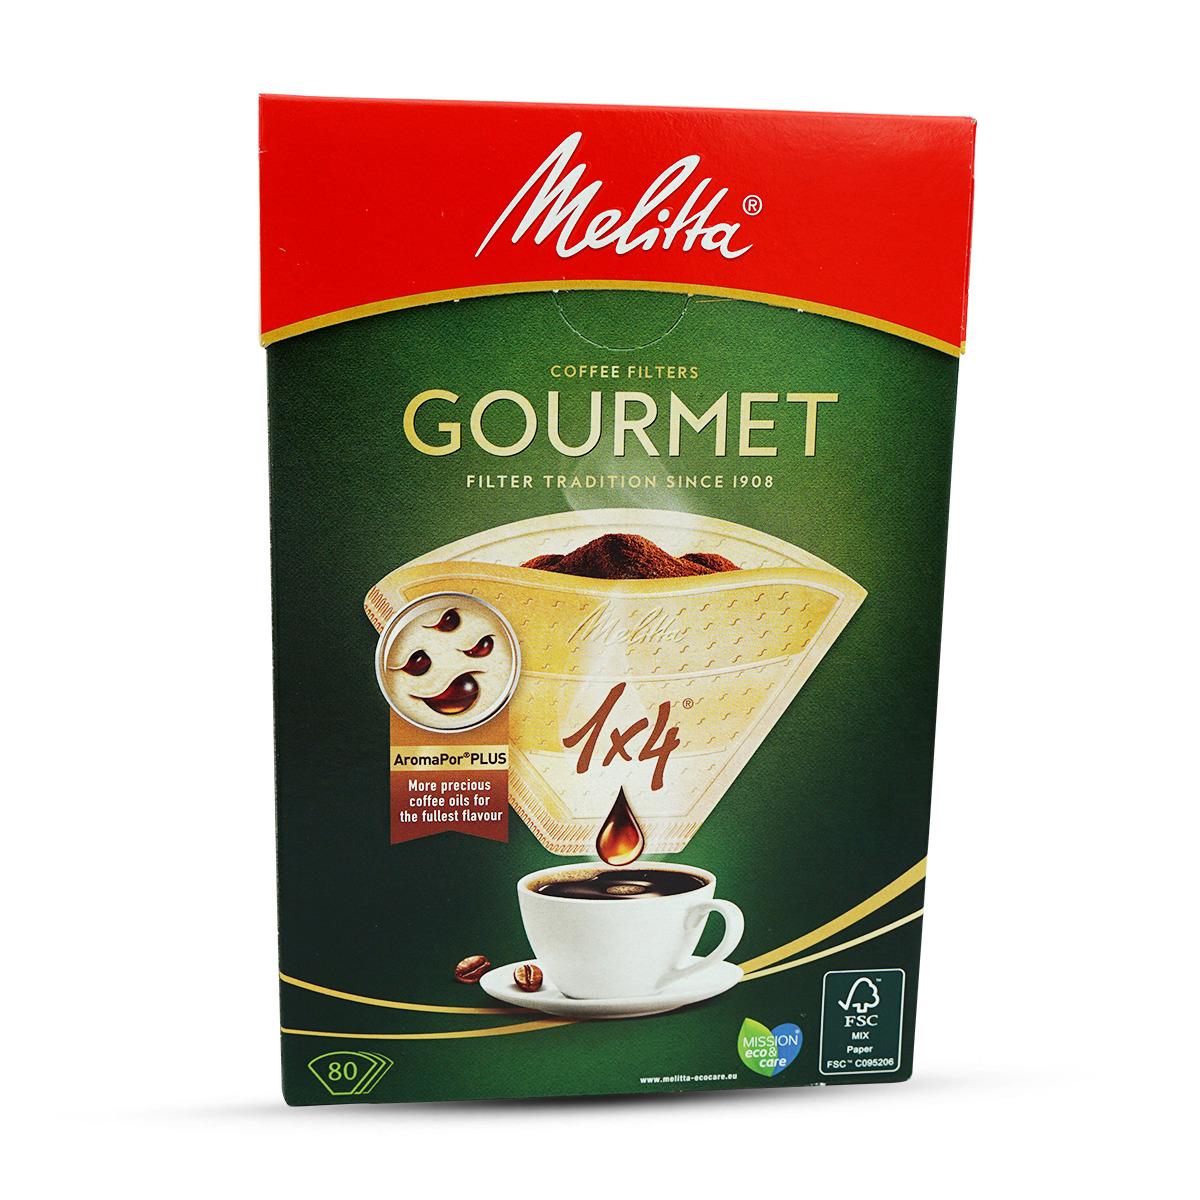 Melitta Kaffee Filtertüten 1x4 80 Stk.